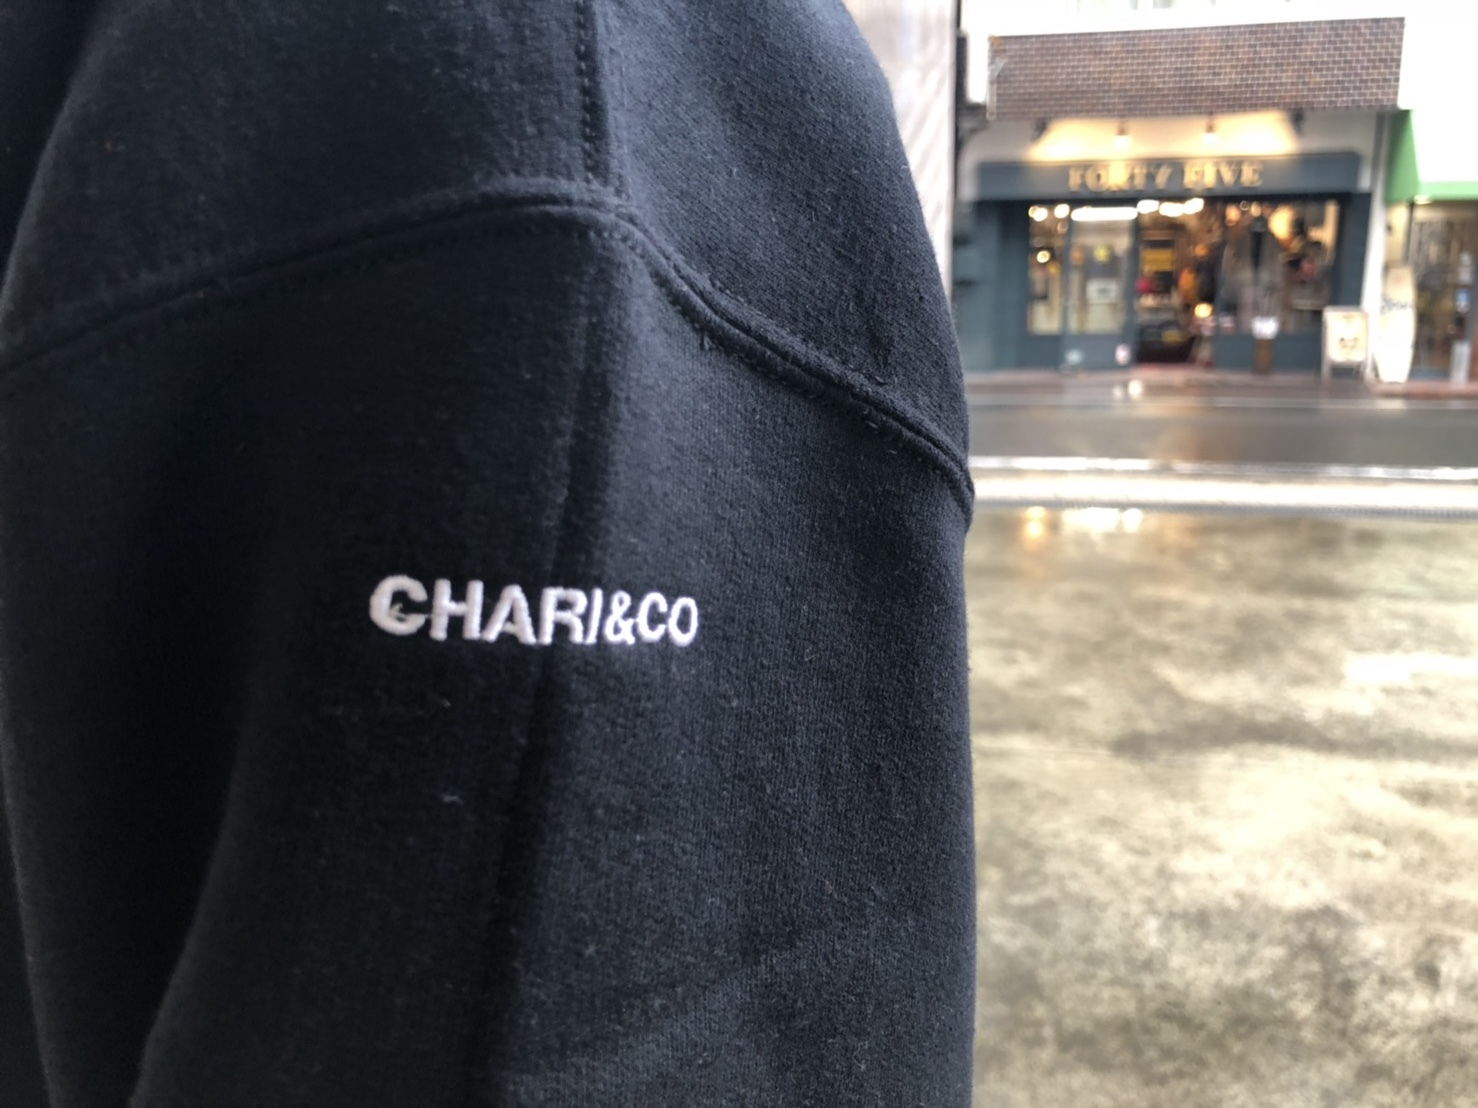 CHARI&CO STYLE!!!_a0221253_14201126.jpeg